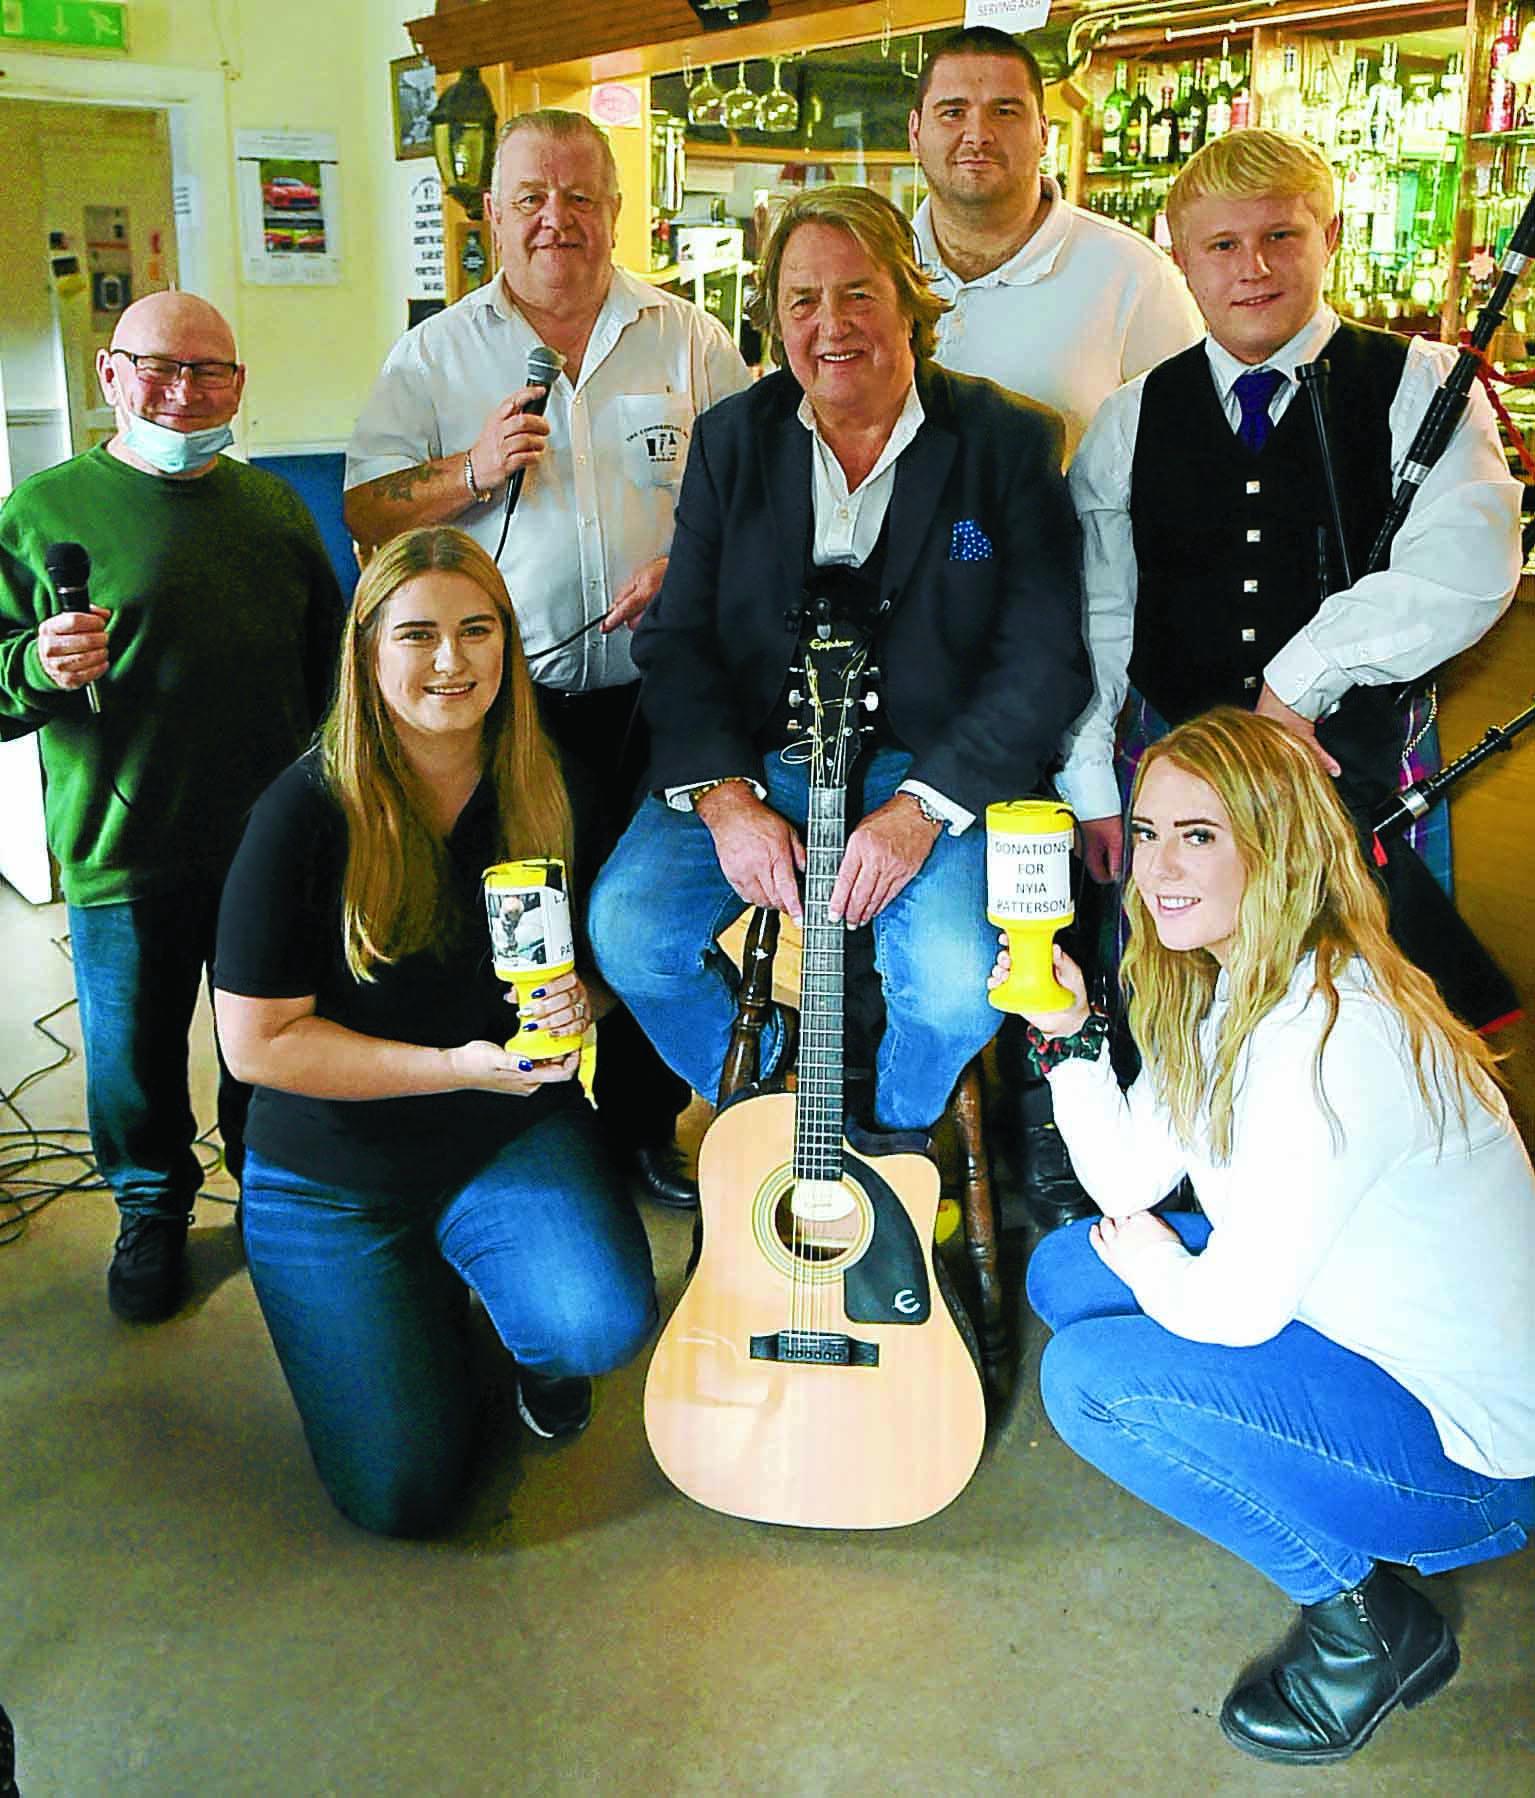 'Phenomenal' fundraising gives family hope